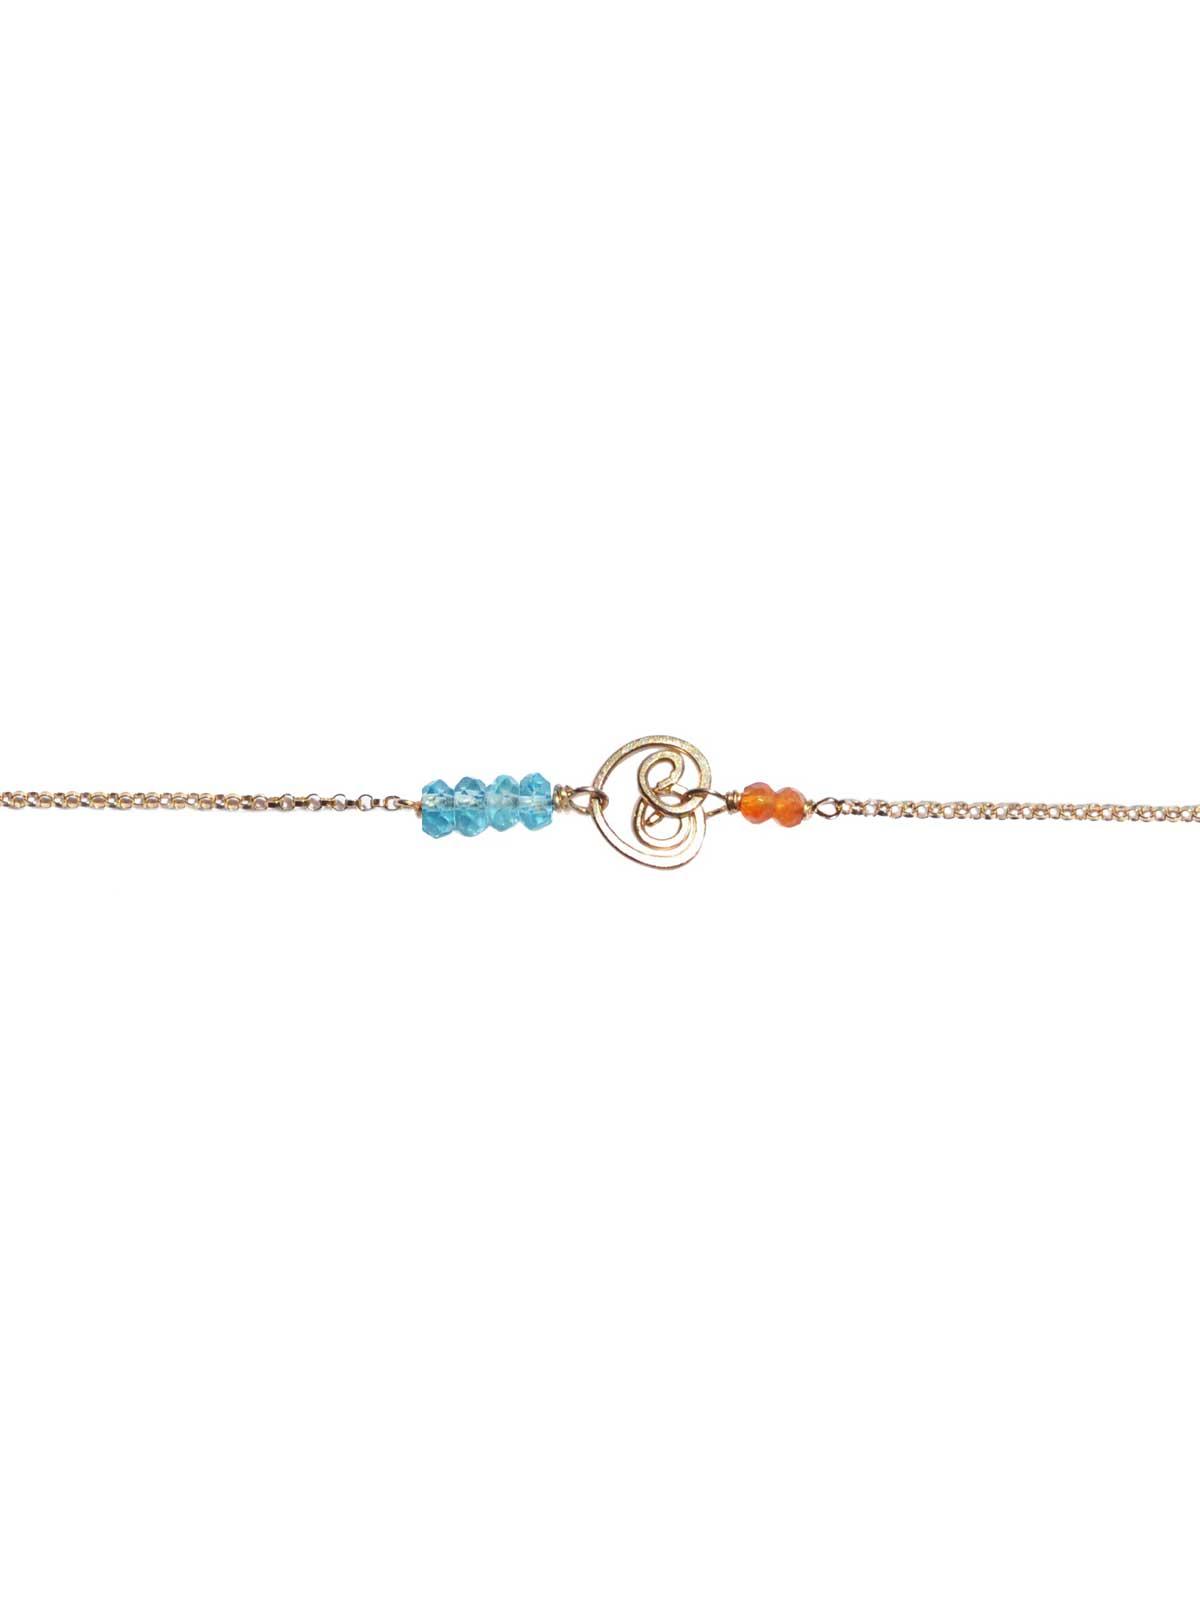 Bracelet Gold Carnelian Apatite